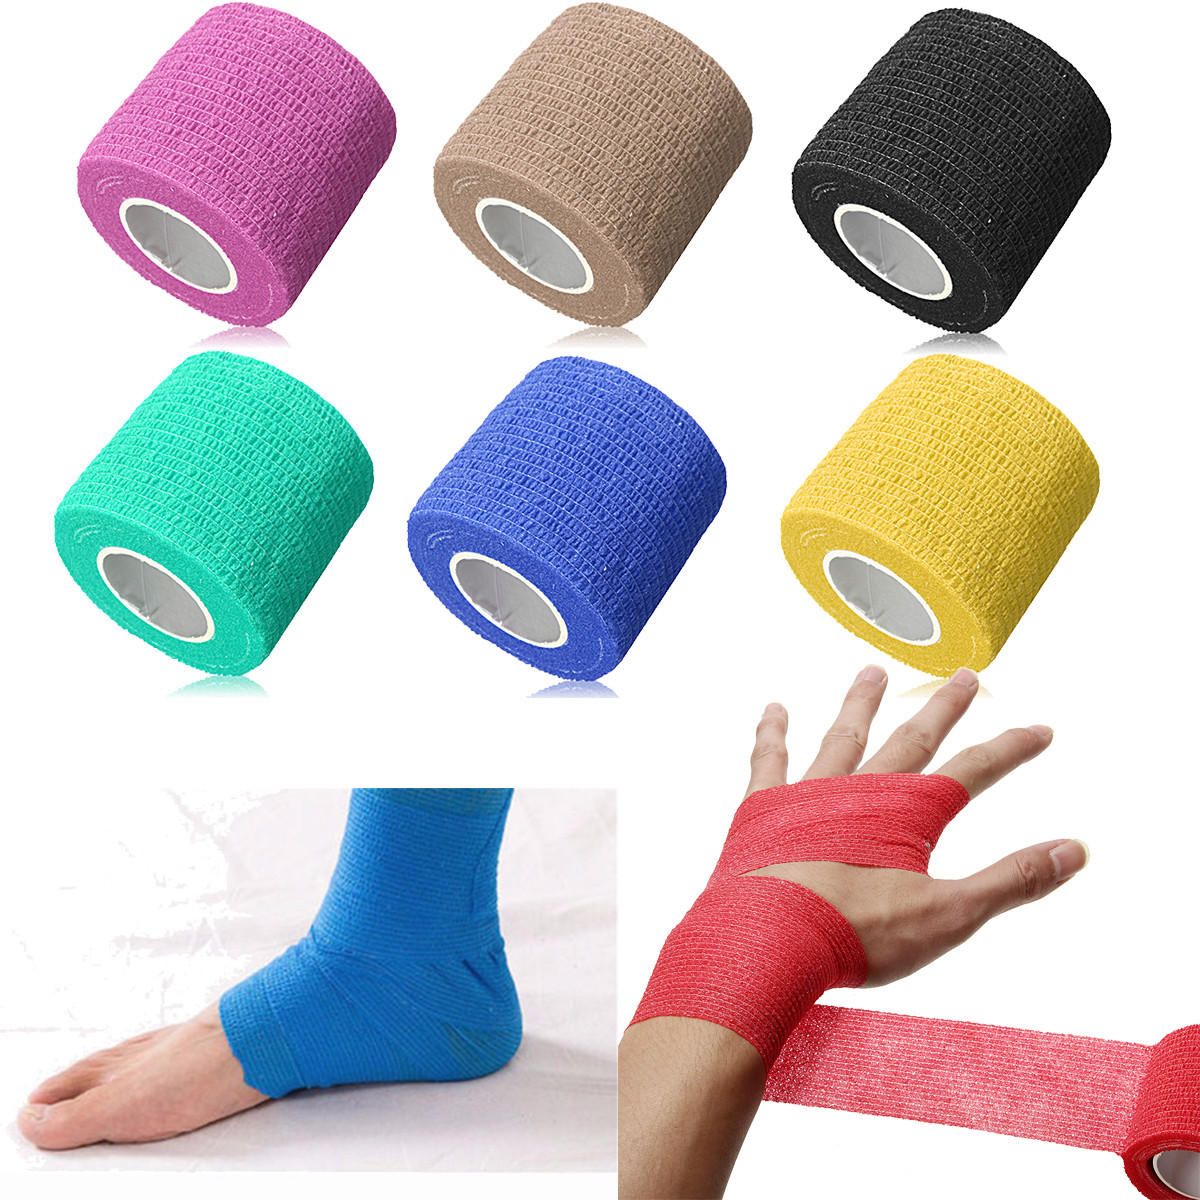 450x5cm Waterproof First Aid Medical Health Self-Adhesive Elastic Bandage Muscle Care Gauze Tape Breathable Waterproof